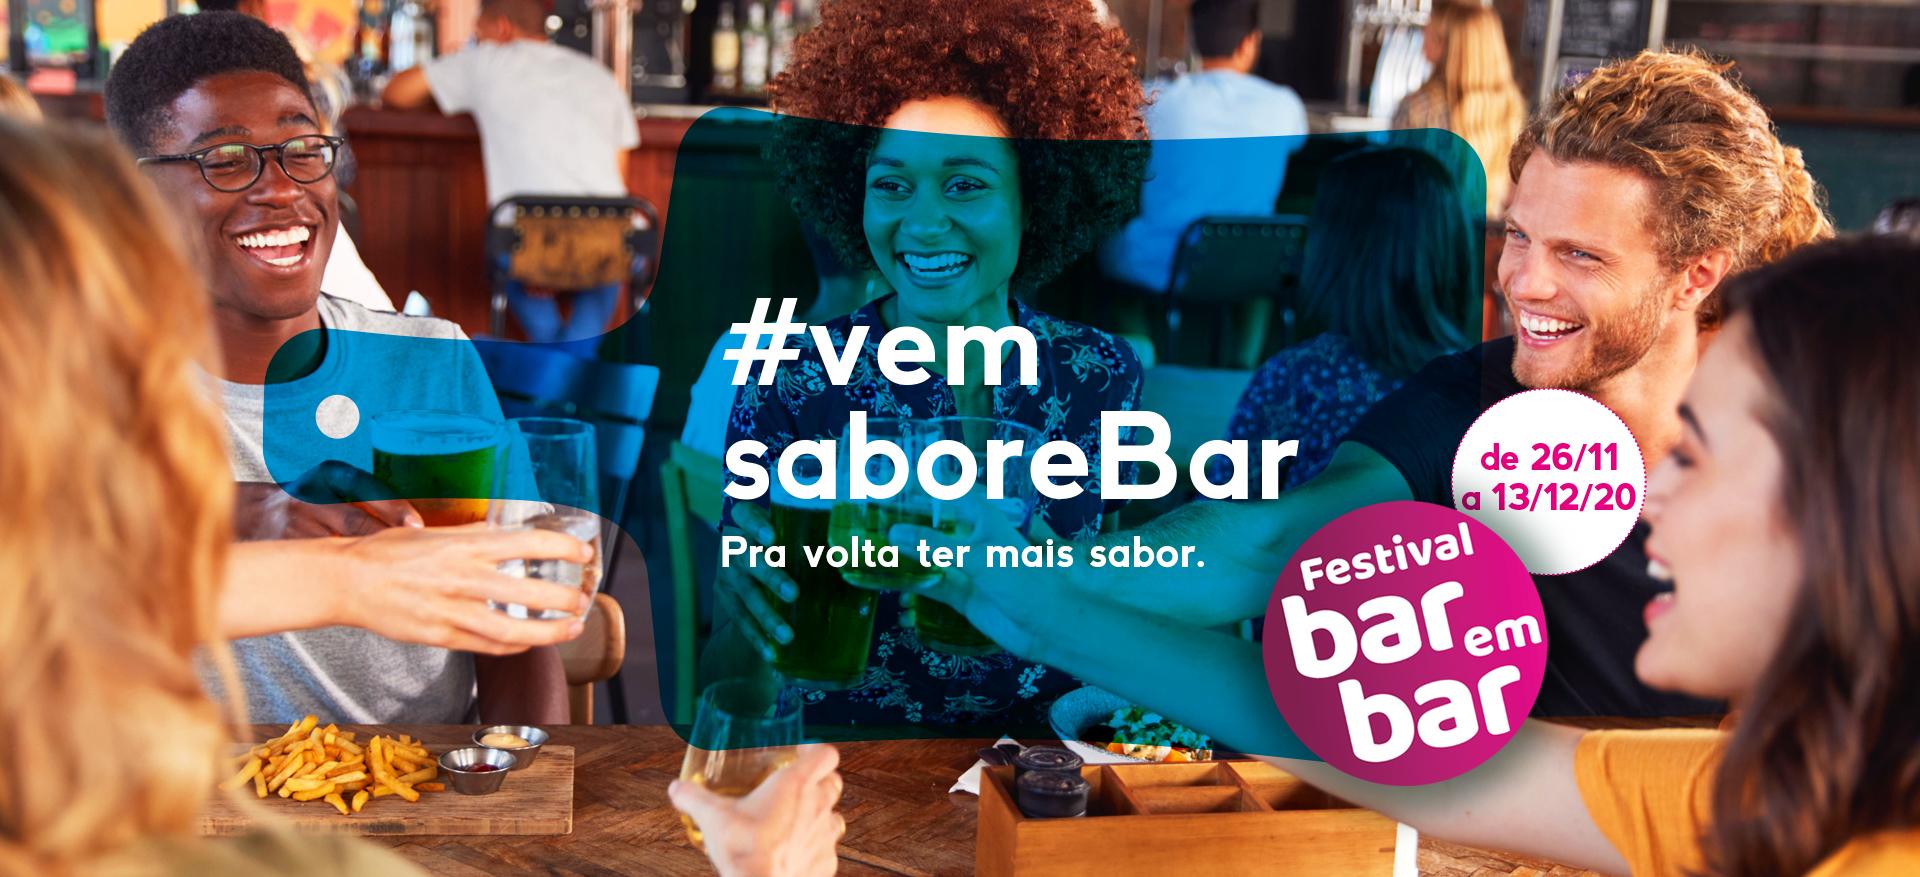 Abrasel promove Festival Bar em Bar